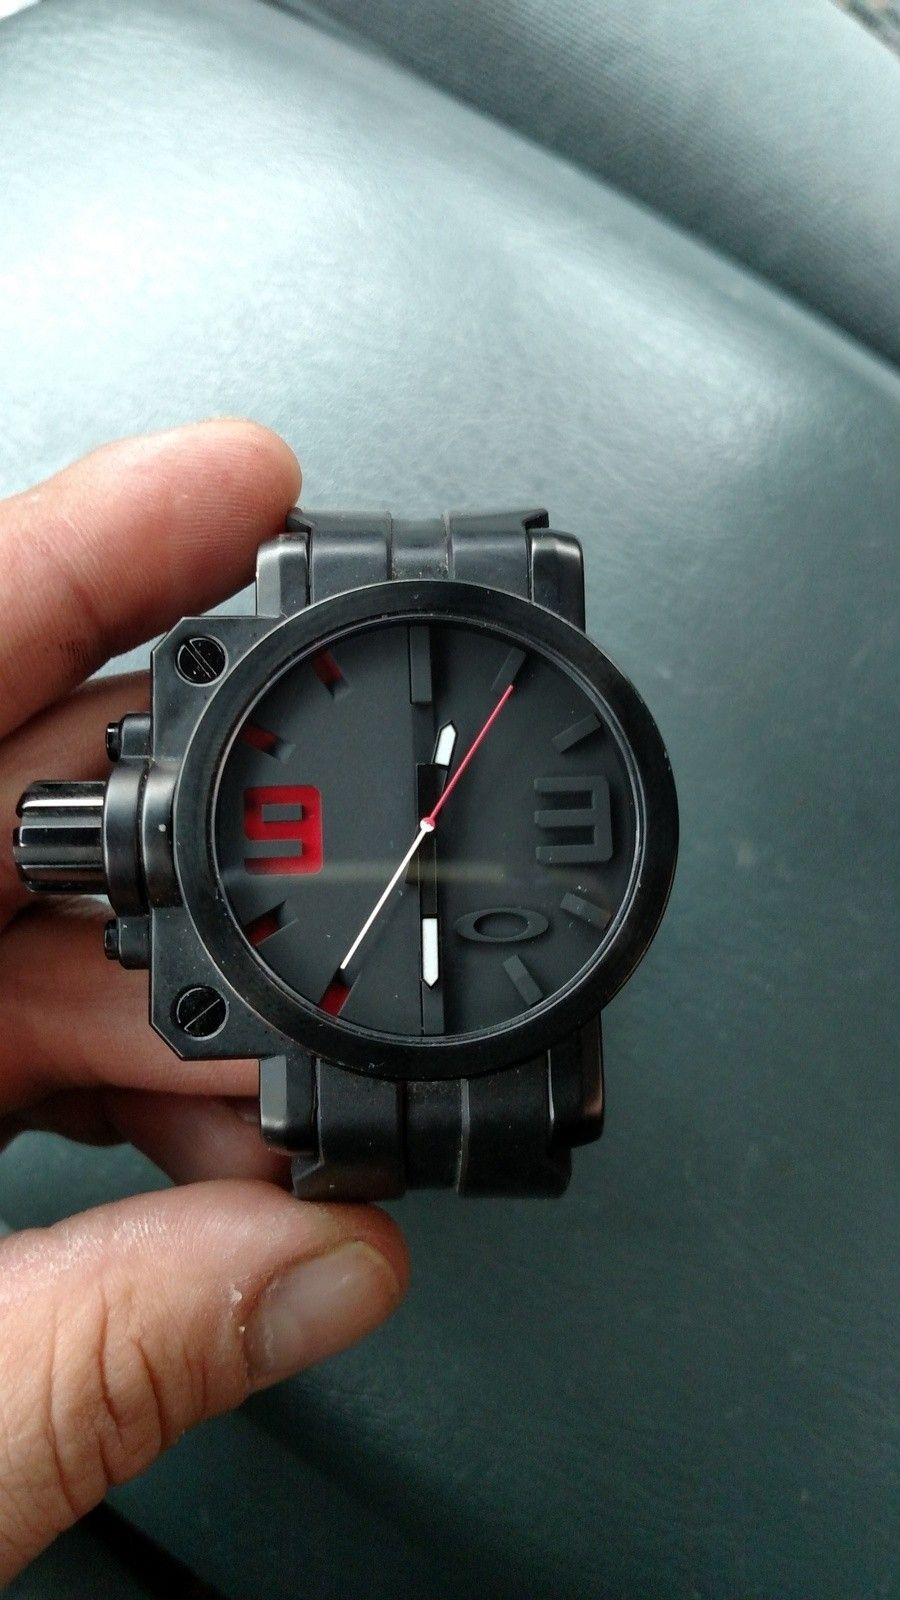 Stealth Gearbox (2nd price drop) - uploadfromtaptalk1445963690682.jpg